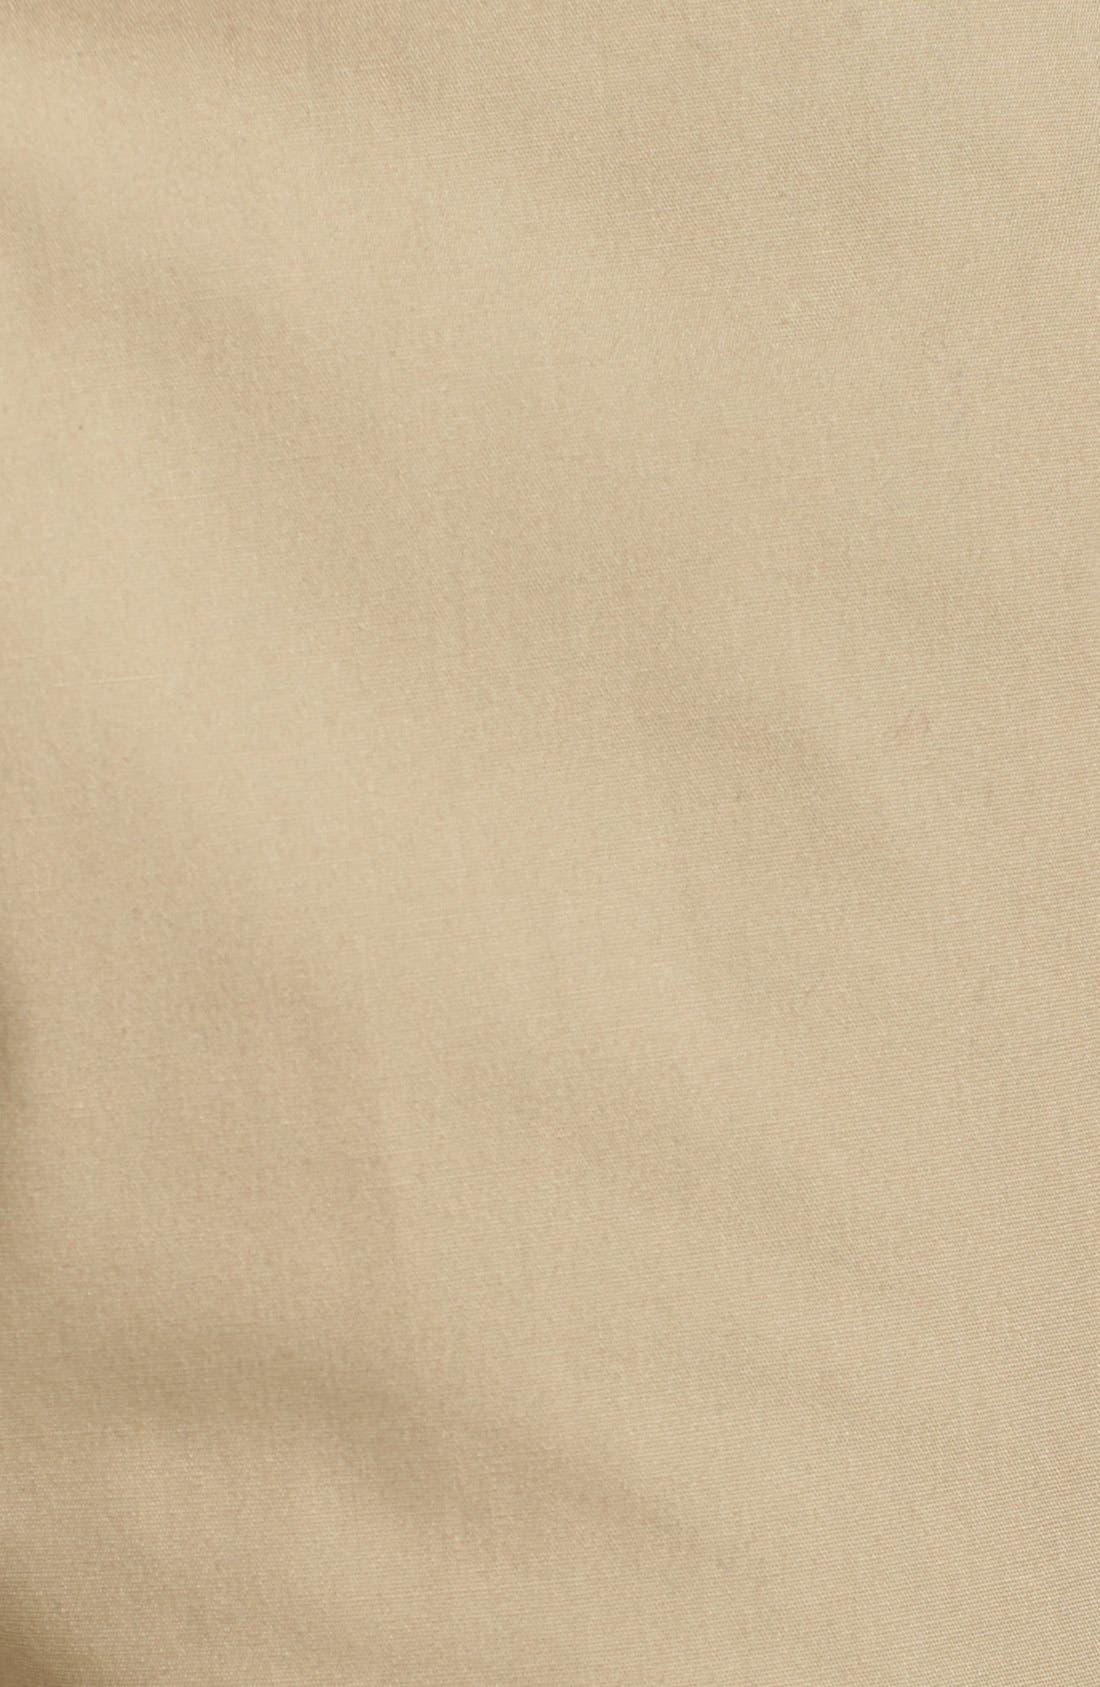 Alternate Image 3  - Quiksilver 'Rockefeller' Shorts